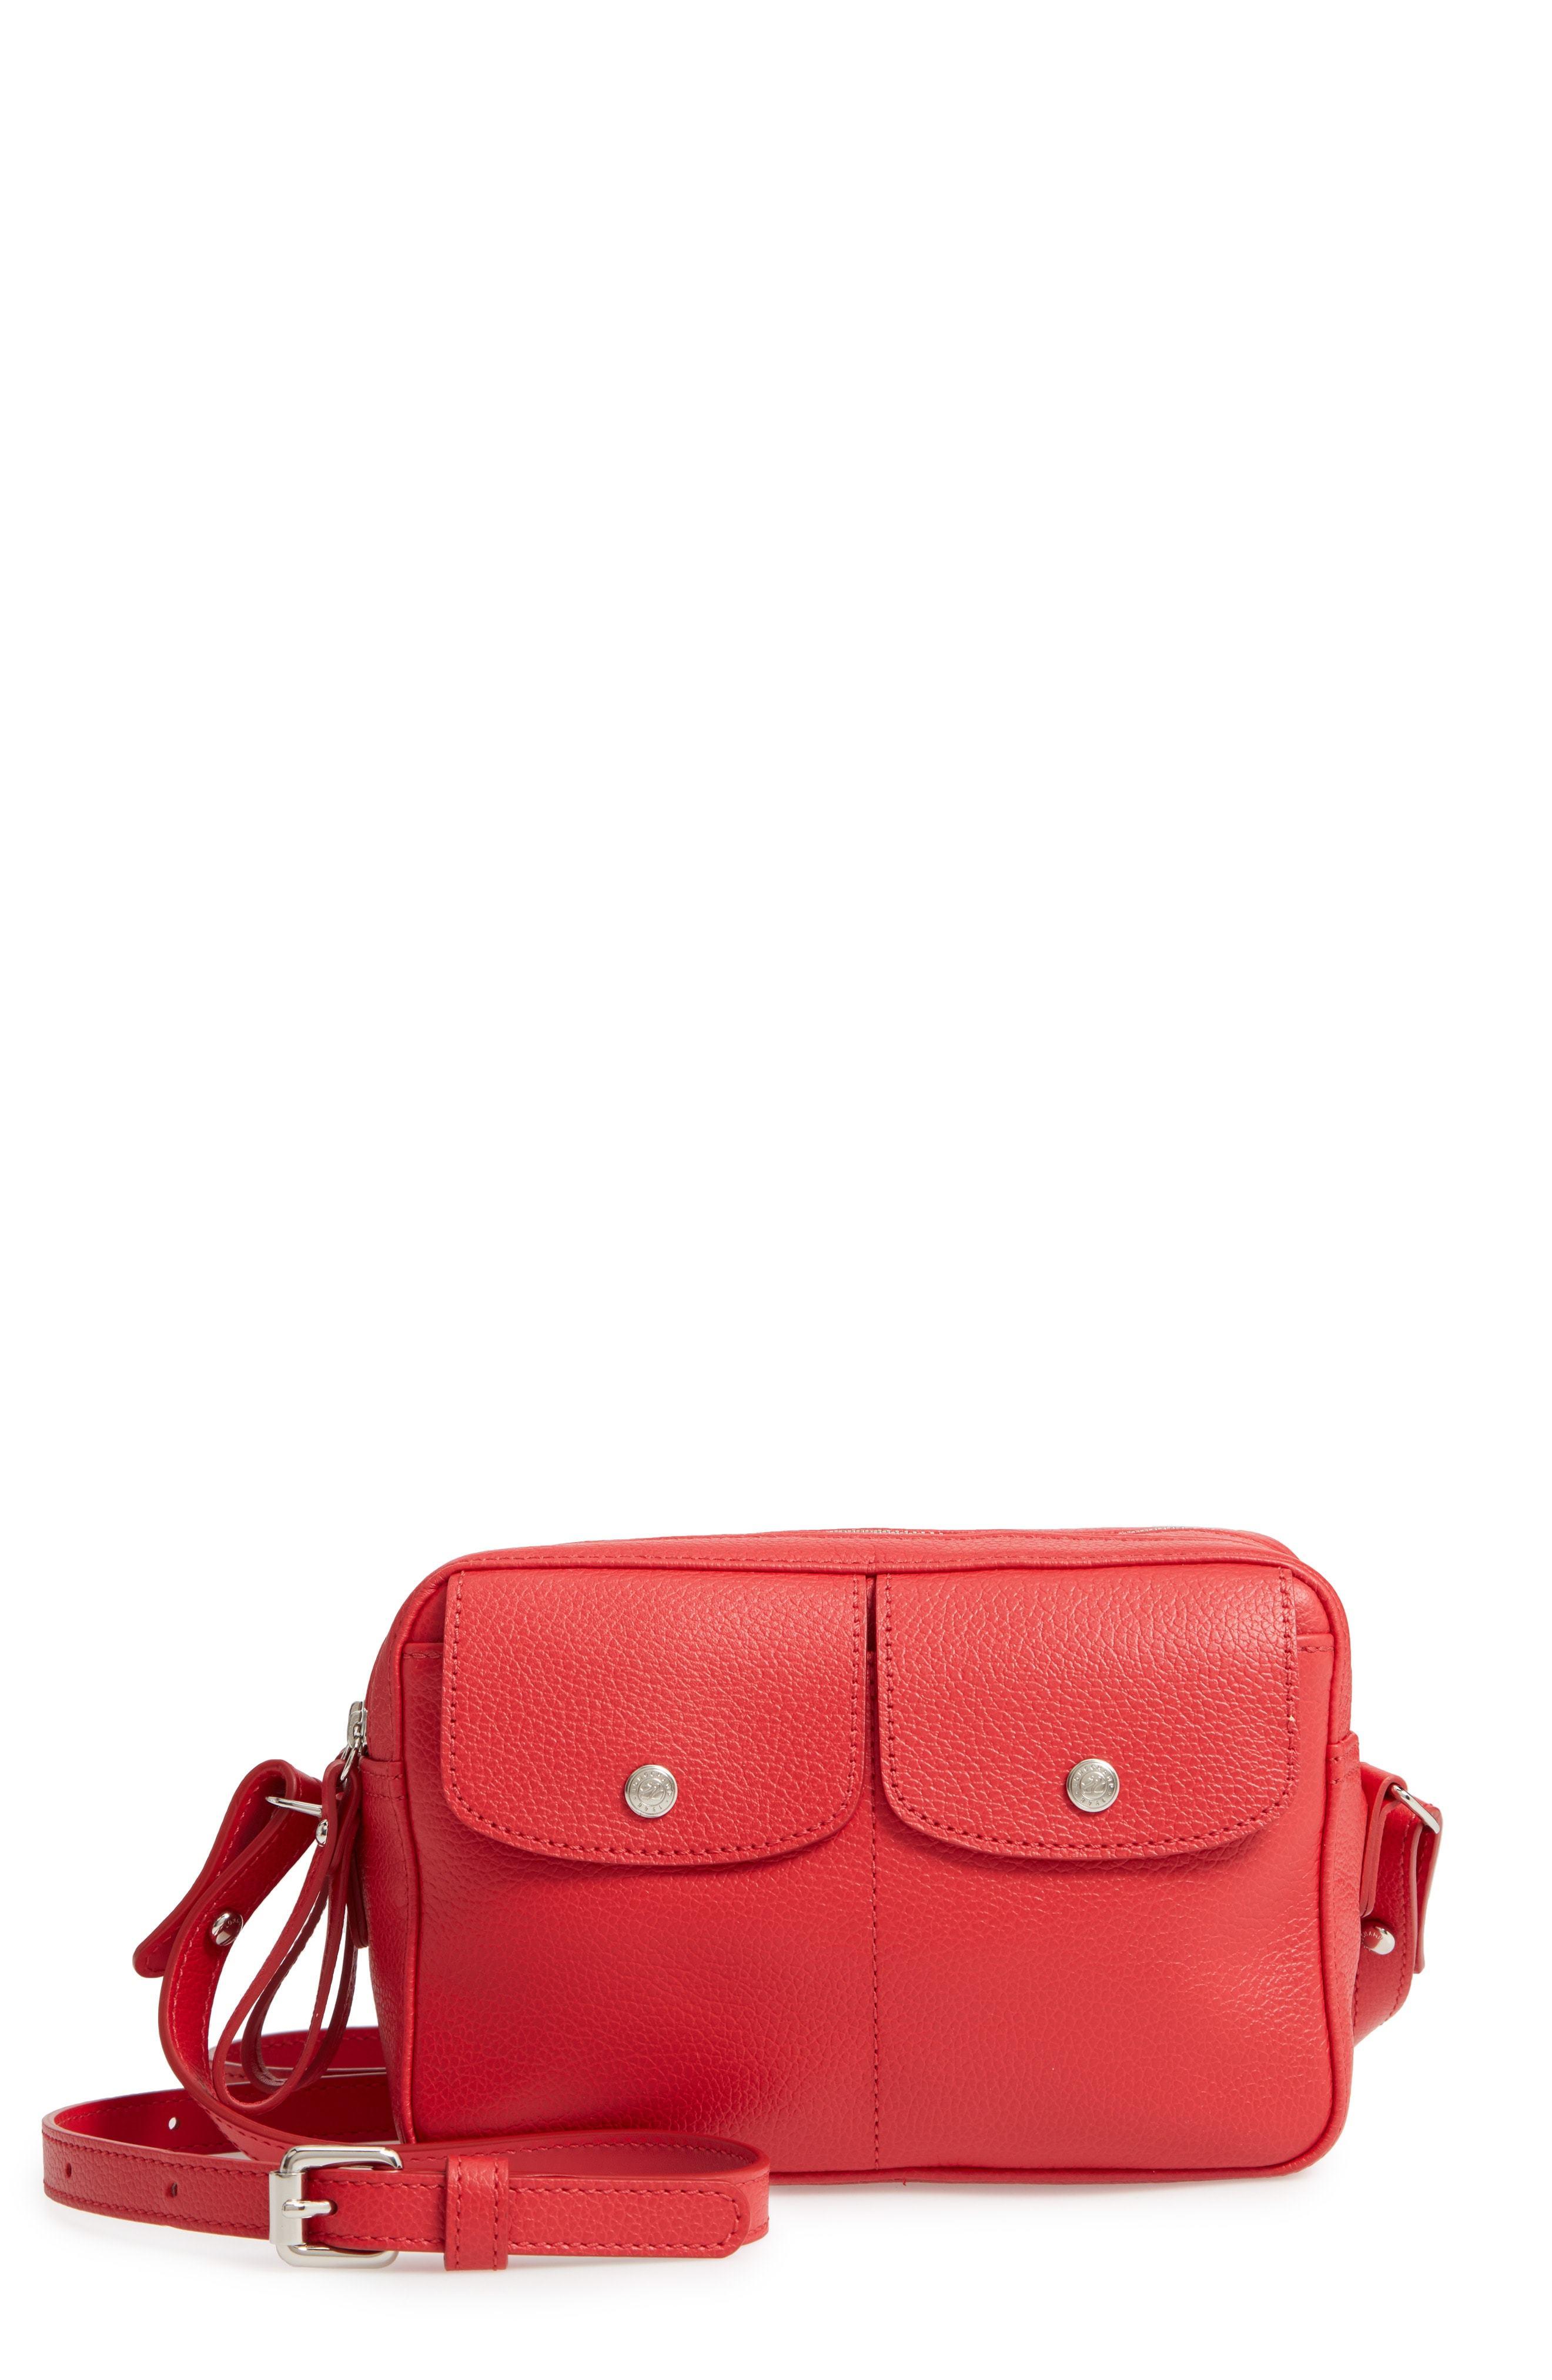 Le Foulonne Leather Camera Bag